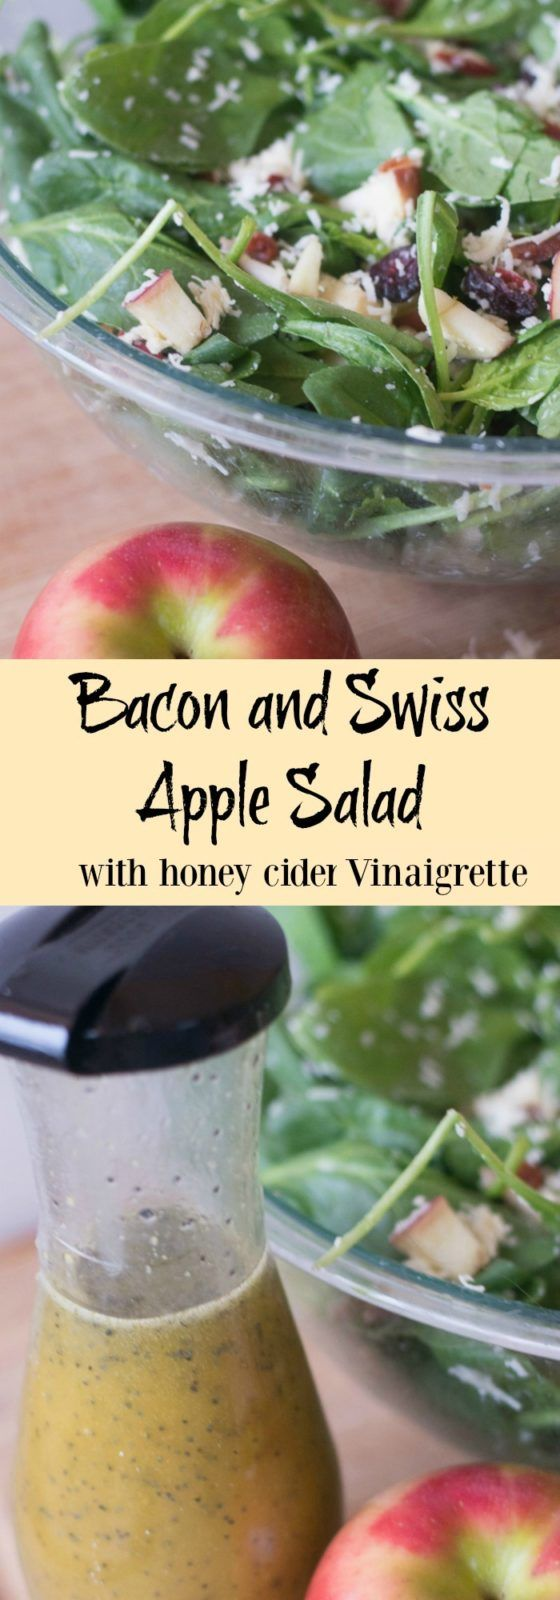 Bacon and swiss apple salad / tangy honey cider vinaigrette / homemade ...